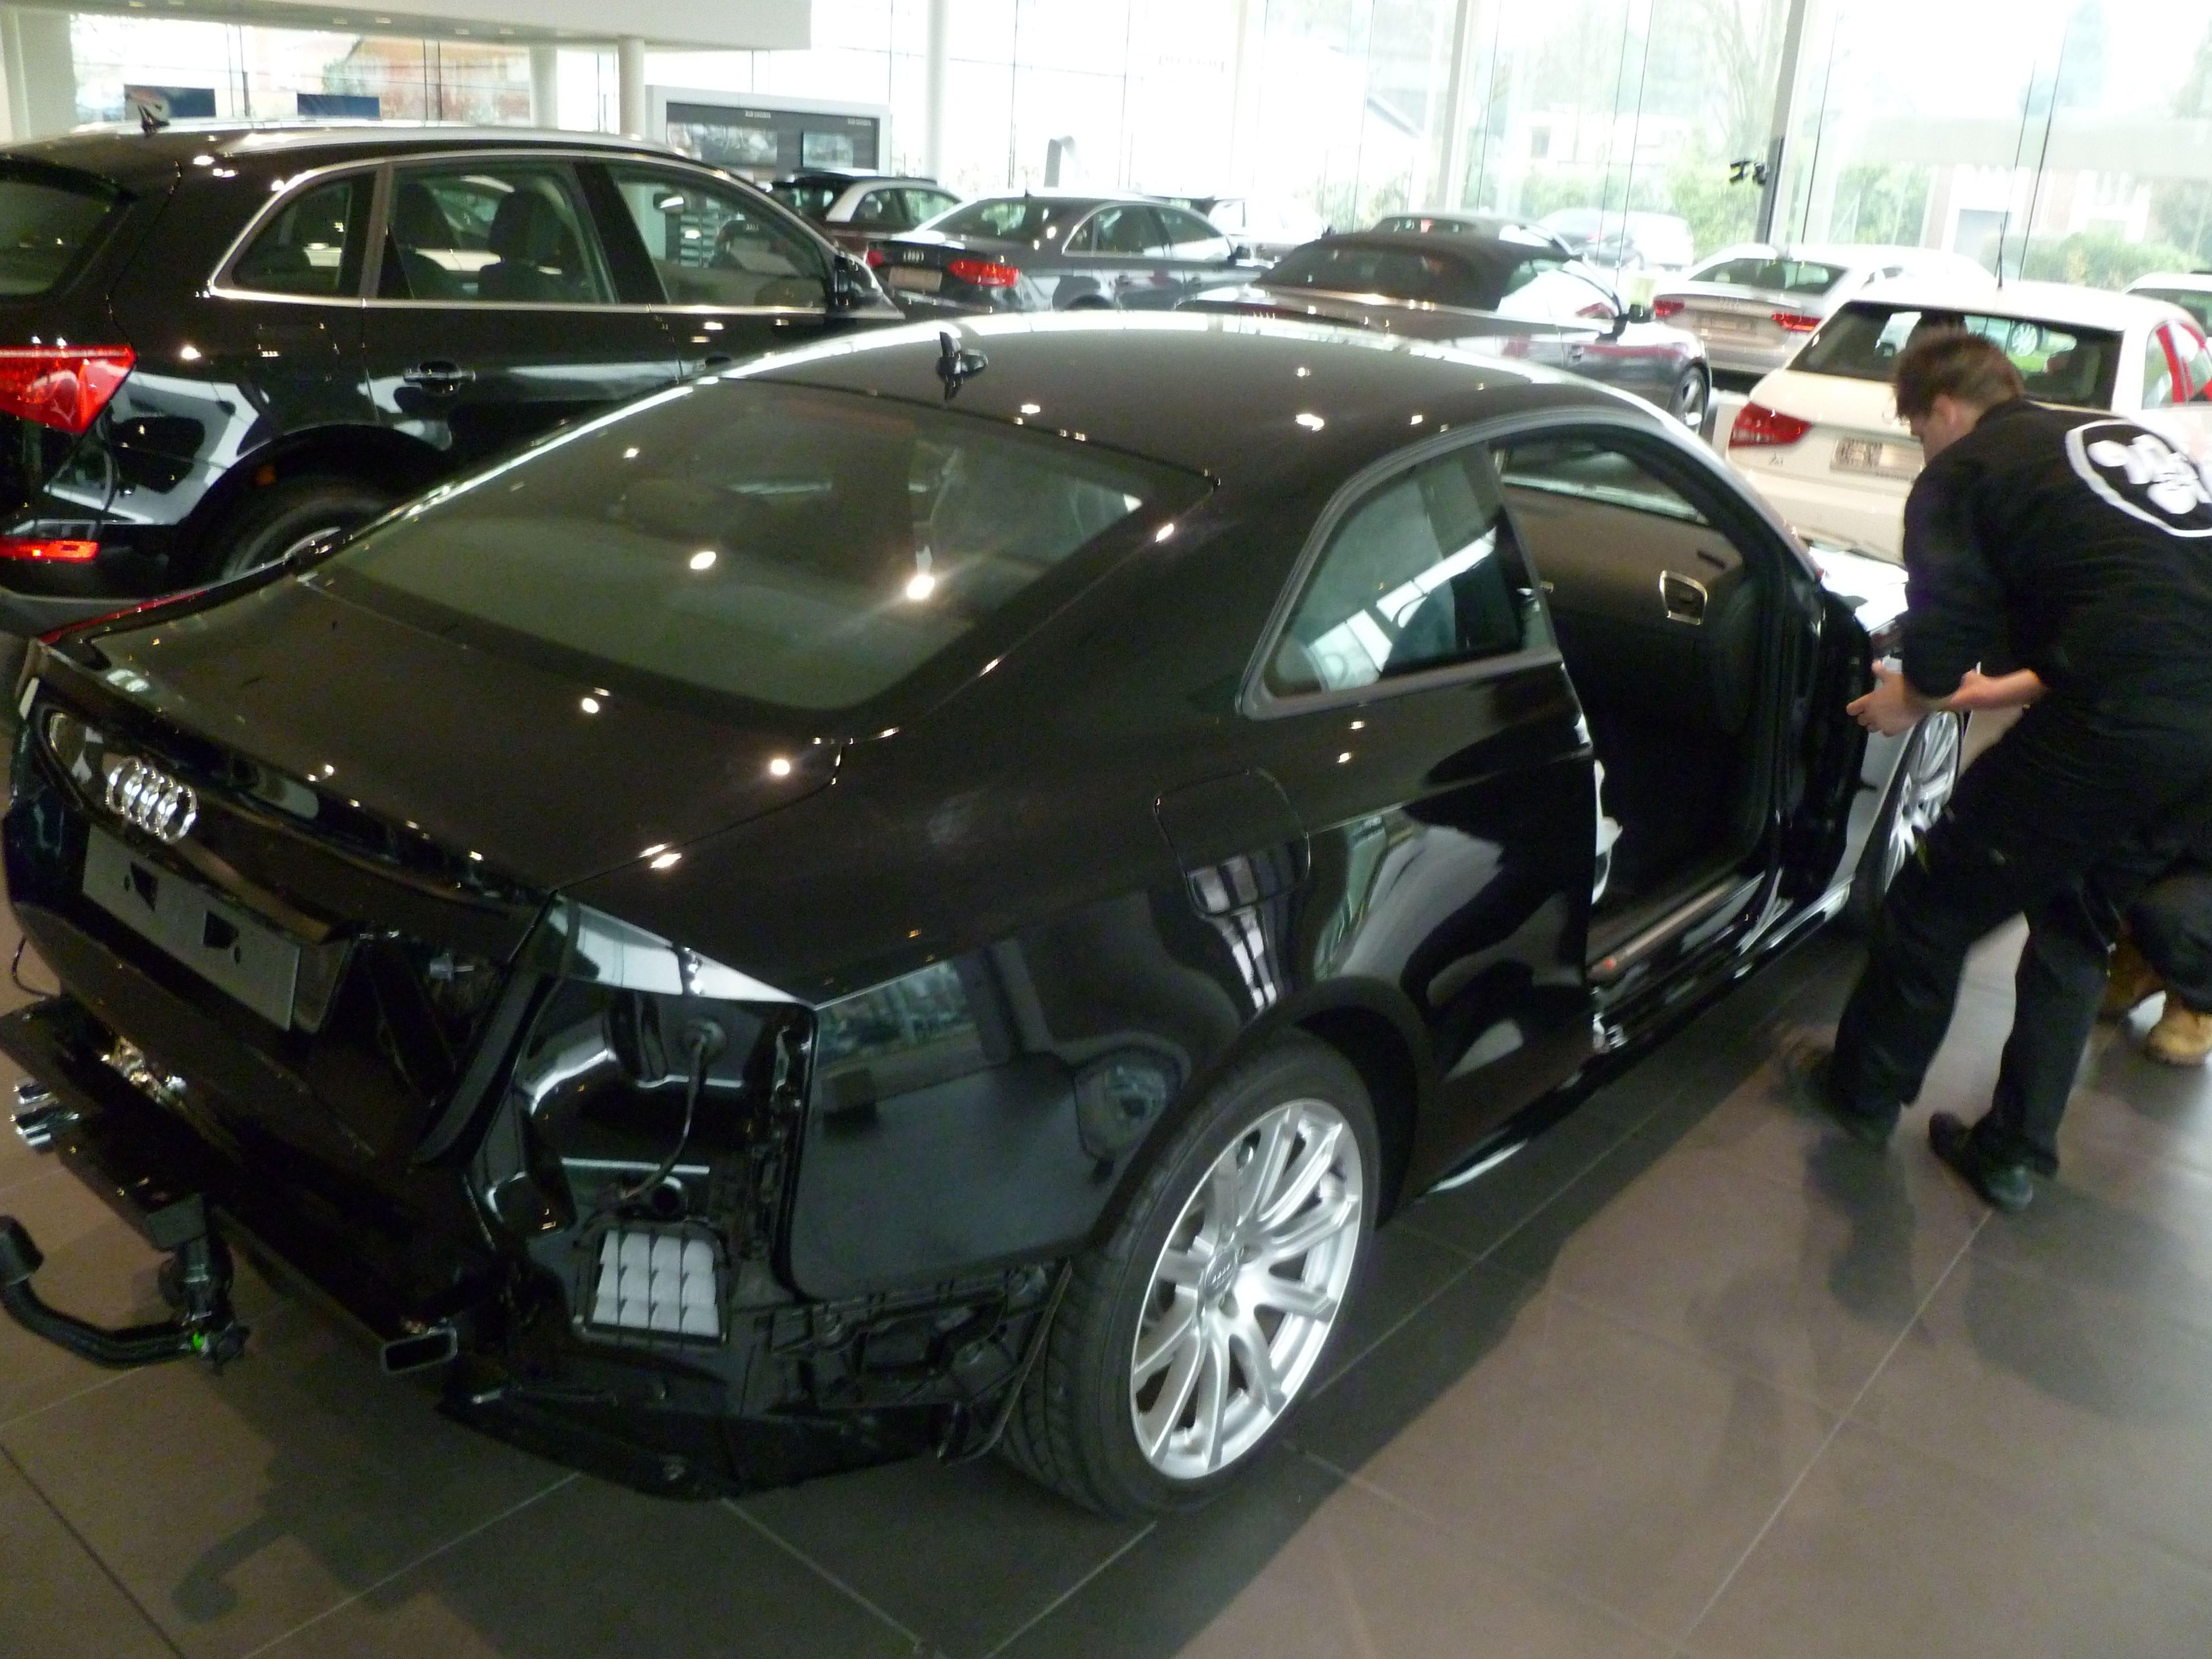 Audi A5 Coupe met Mat Zwarte Wrap, Carwrapping door Wrapmyride.nu Foto-nr:4614, ©2021